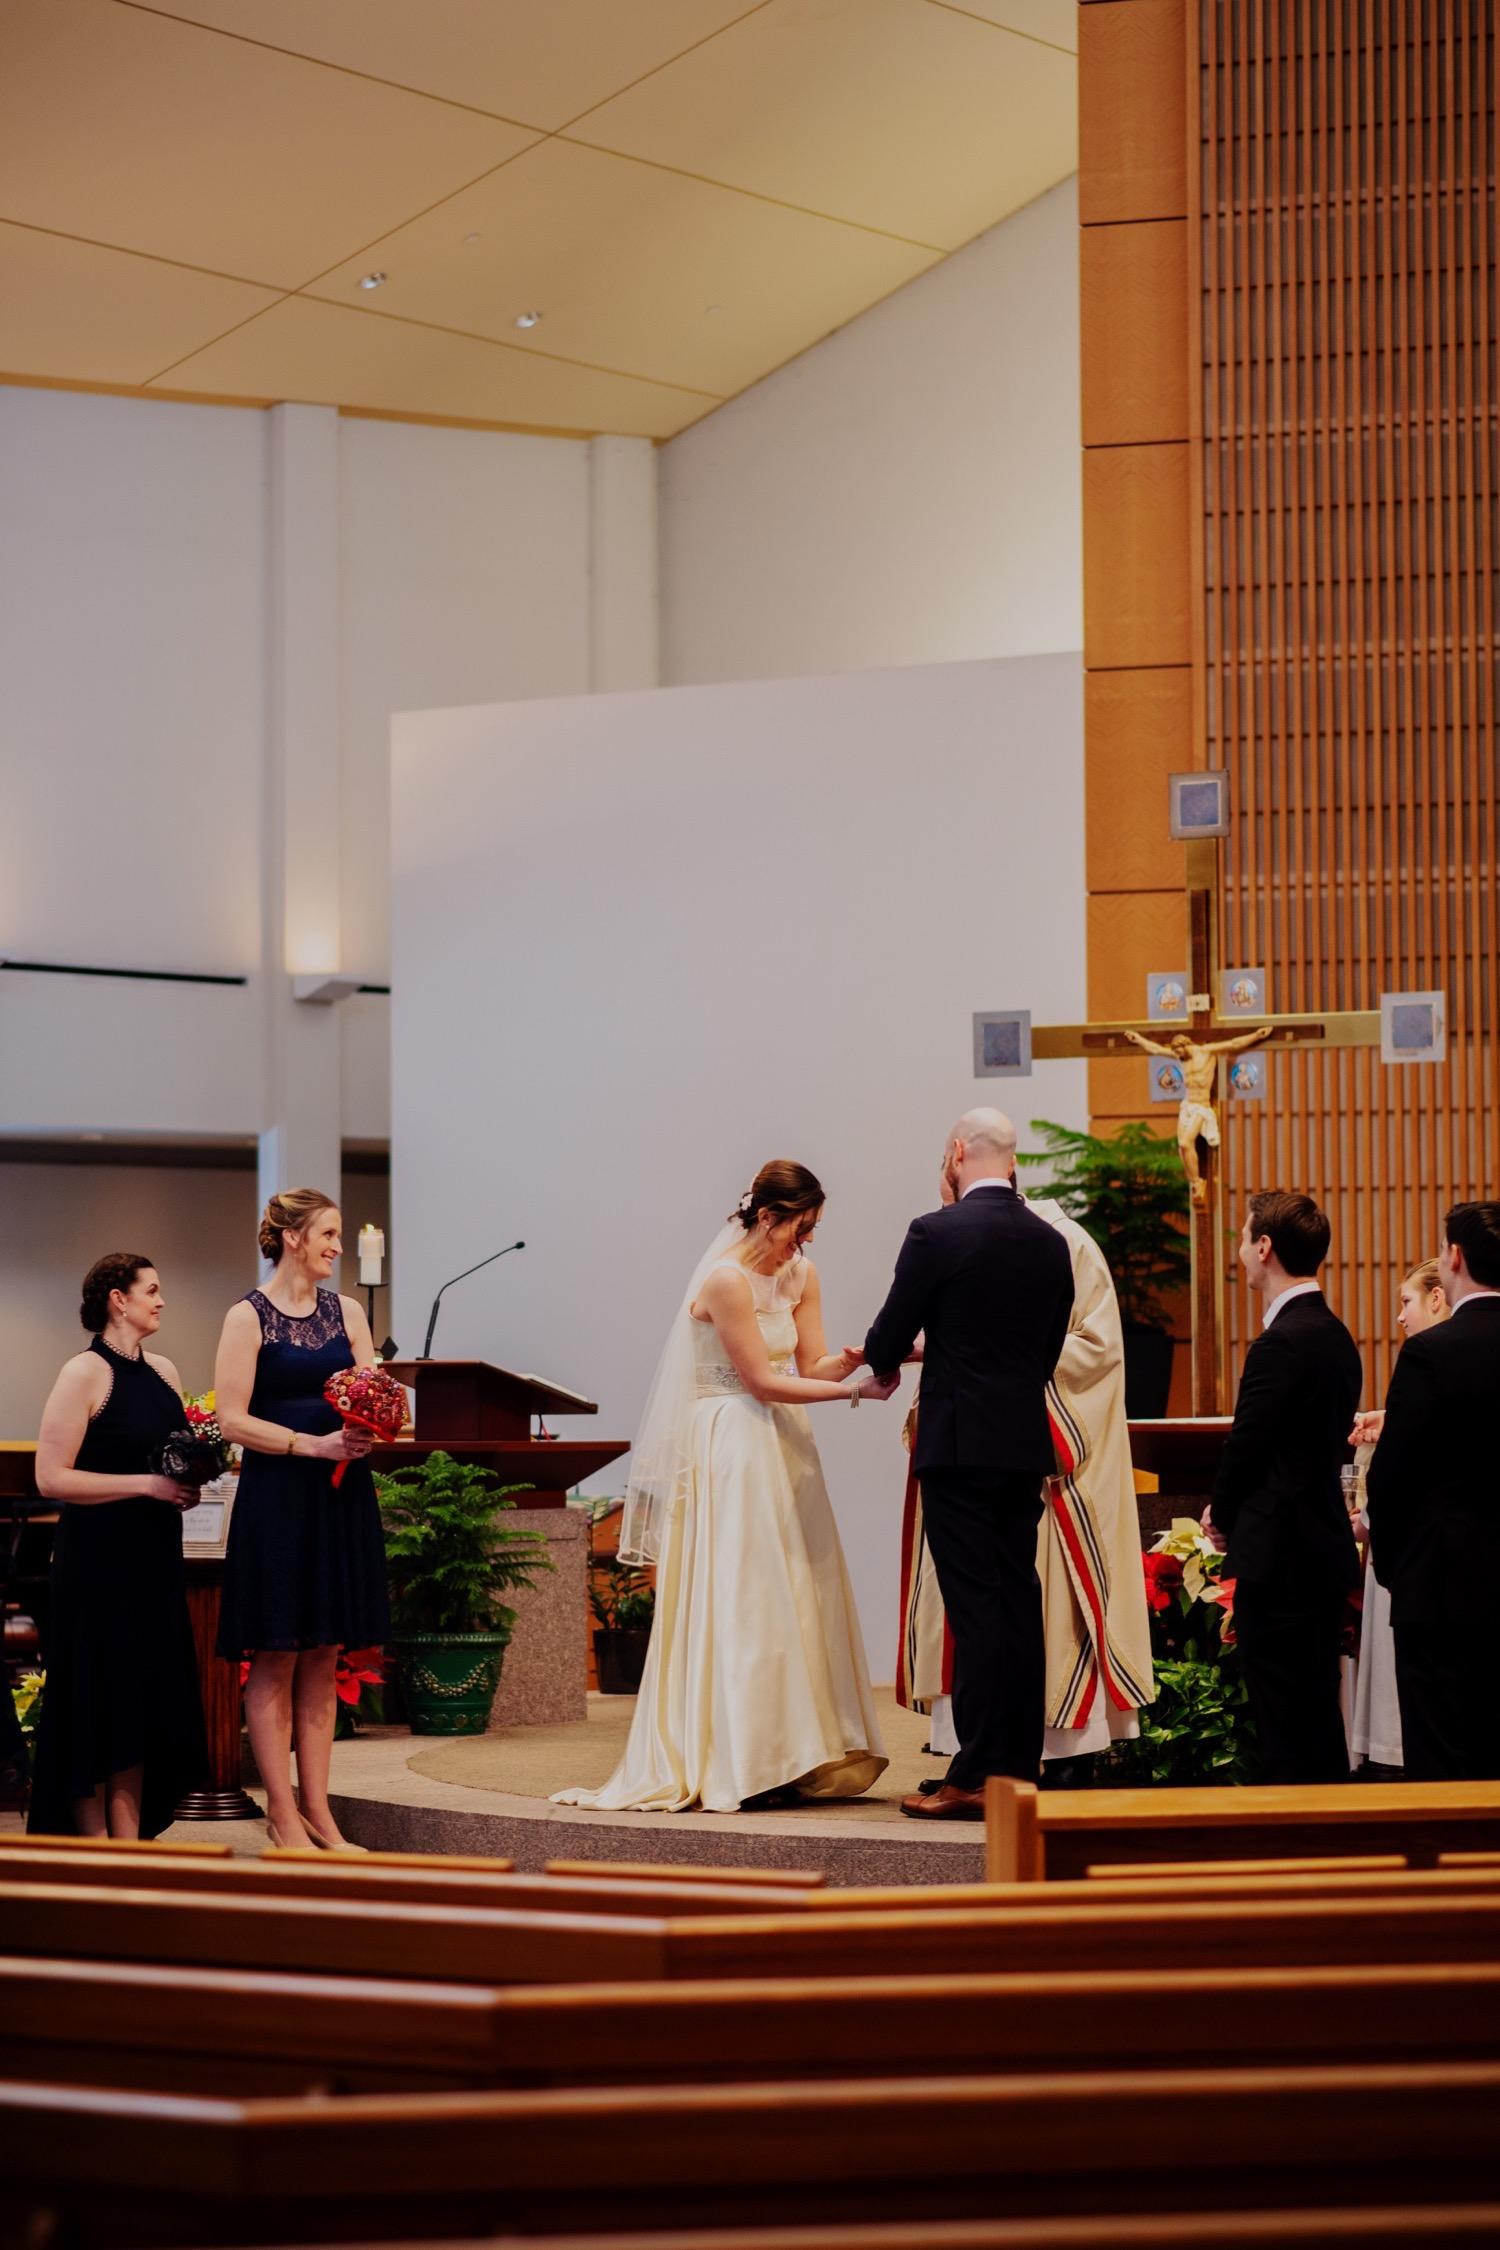 047_McGrath-Libertyville-IndependenceGrove-Winter-Wedding_0067_Independencegrovewedding.jpg